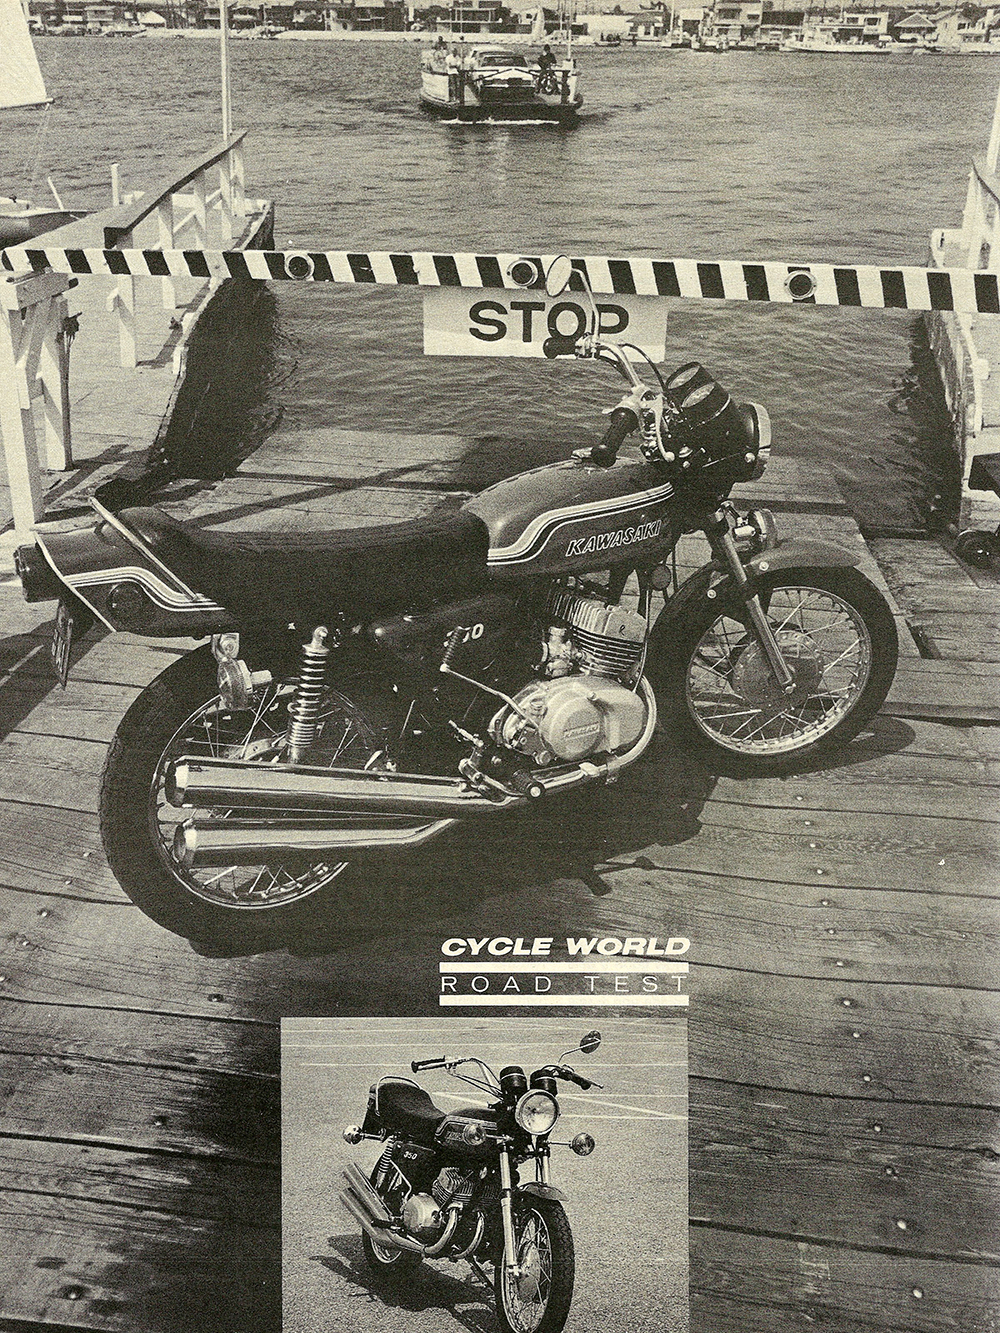 1971 Kawasaki 350 S2 road test 01.jpg